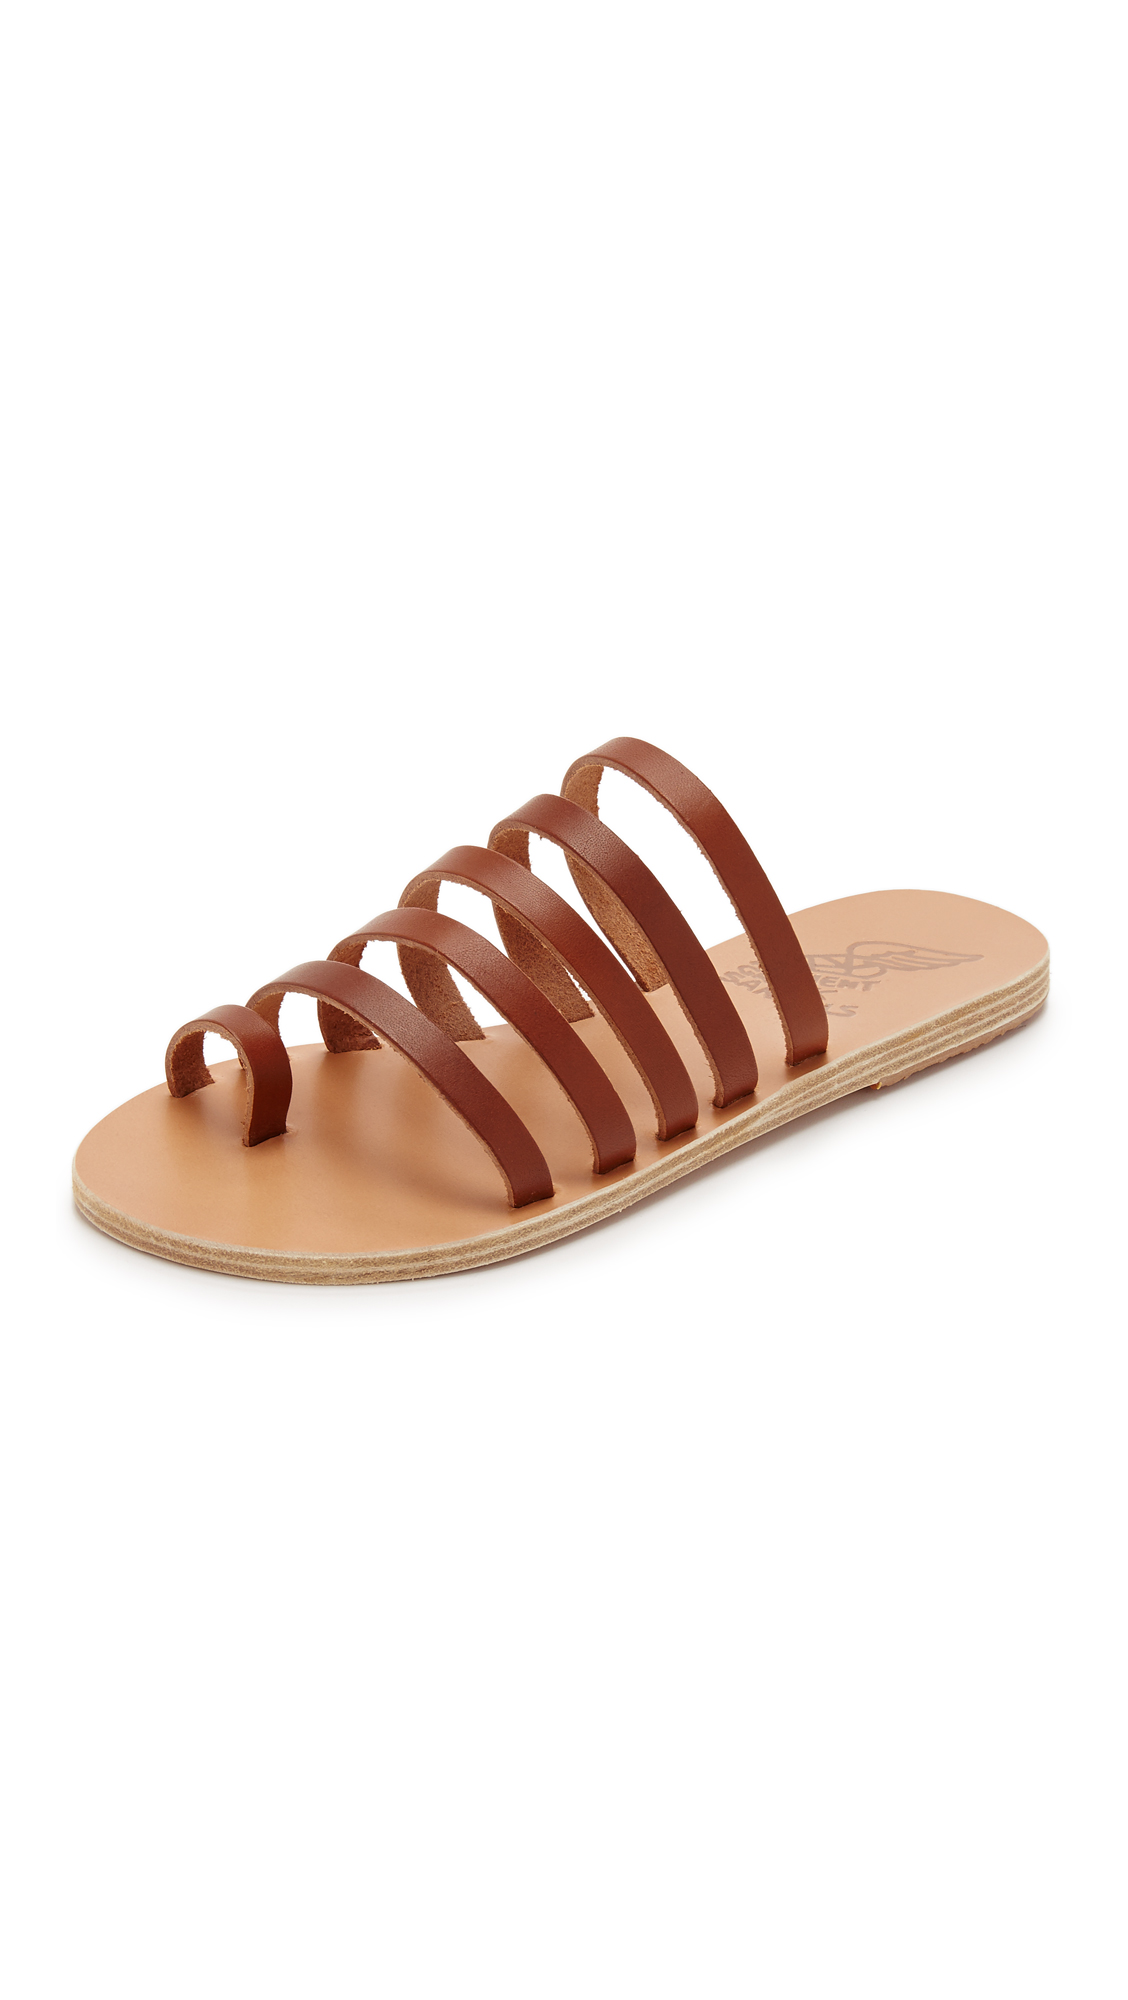 Ancient Greek Sandals Niki Flat Sandals - Cotto at Shopbop